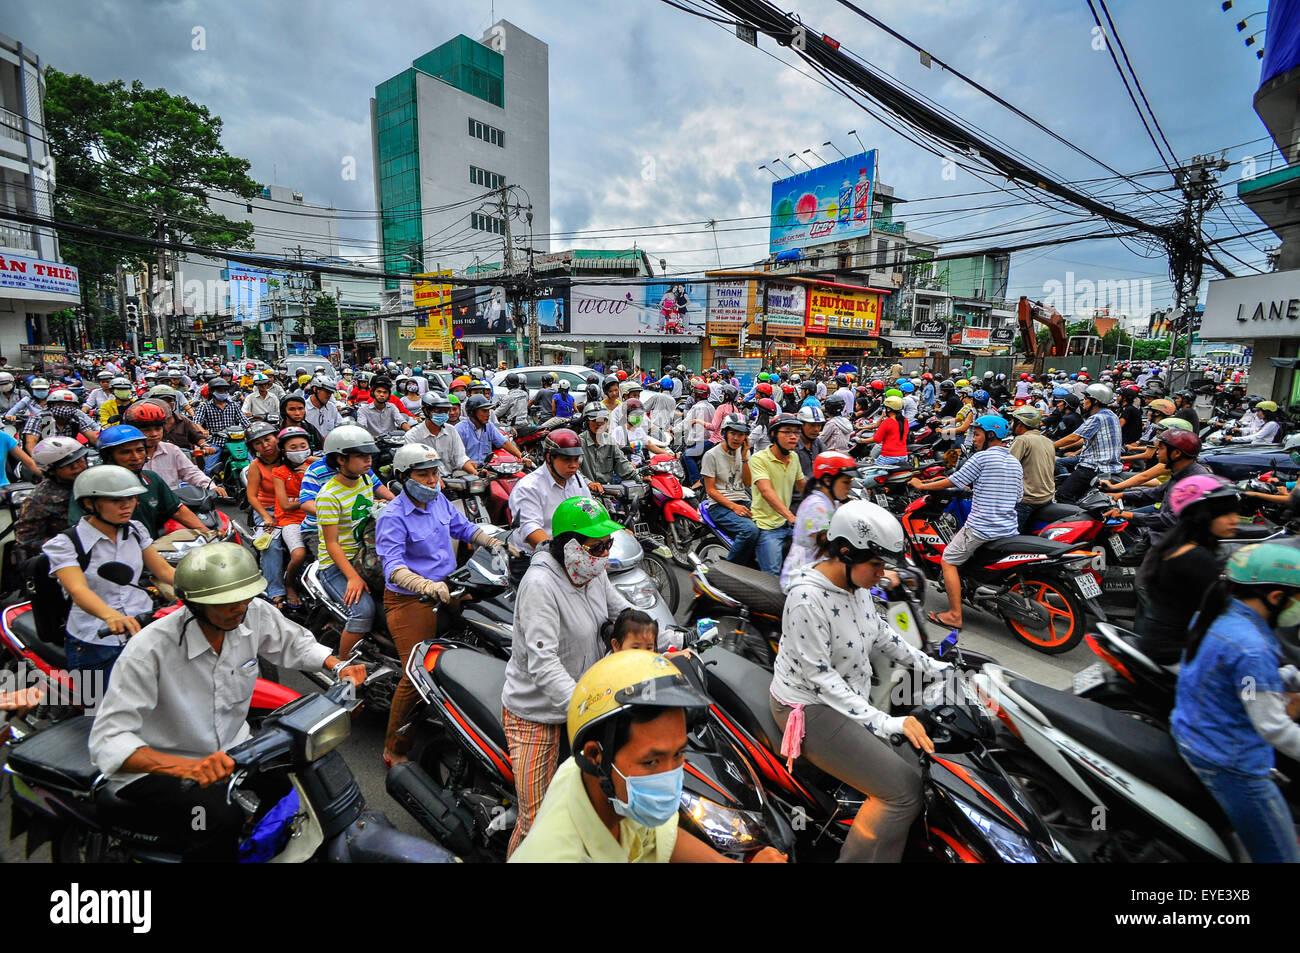 Saigon, Vietnam - 15.Juni: Straßenverkehr am 15. Juni 2011 in Saigon (Ho-Chi-Minh-Stadt), Vietnam. Ho Chi Minh Stockbild